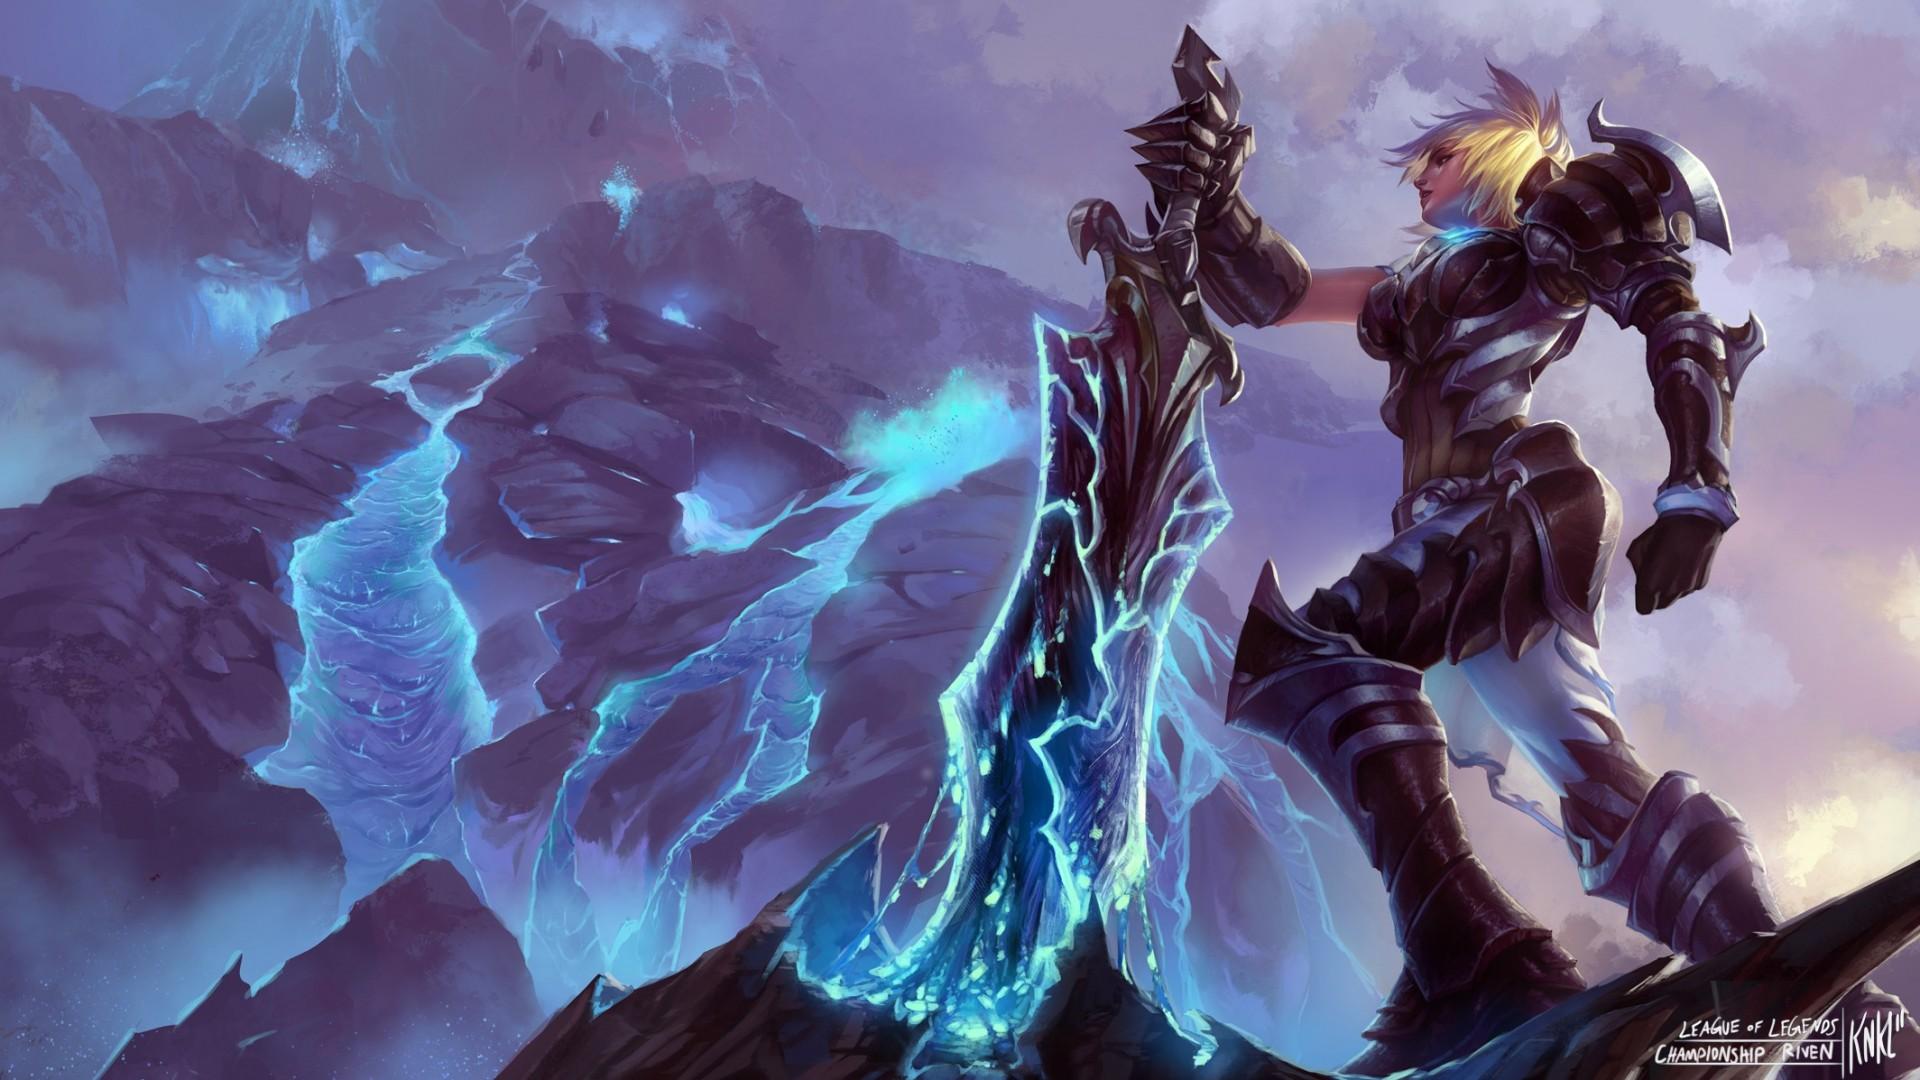 Championship Riven Wallpaper - League of Legends Wallpapers